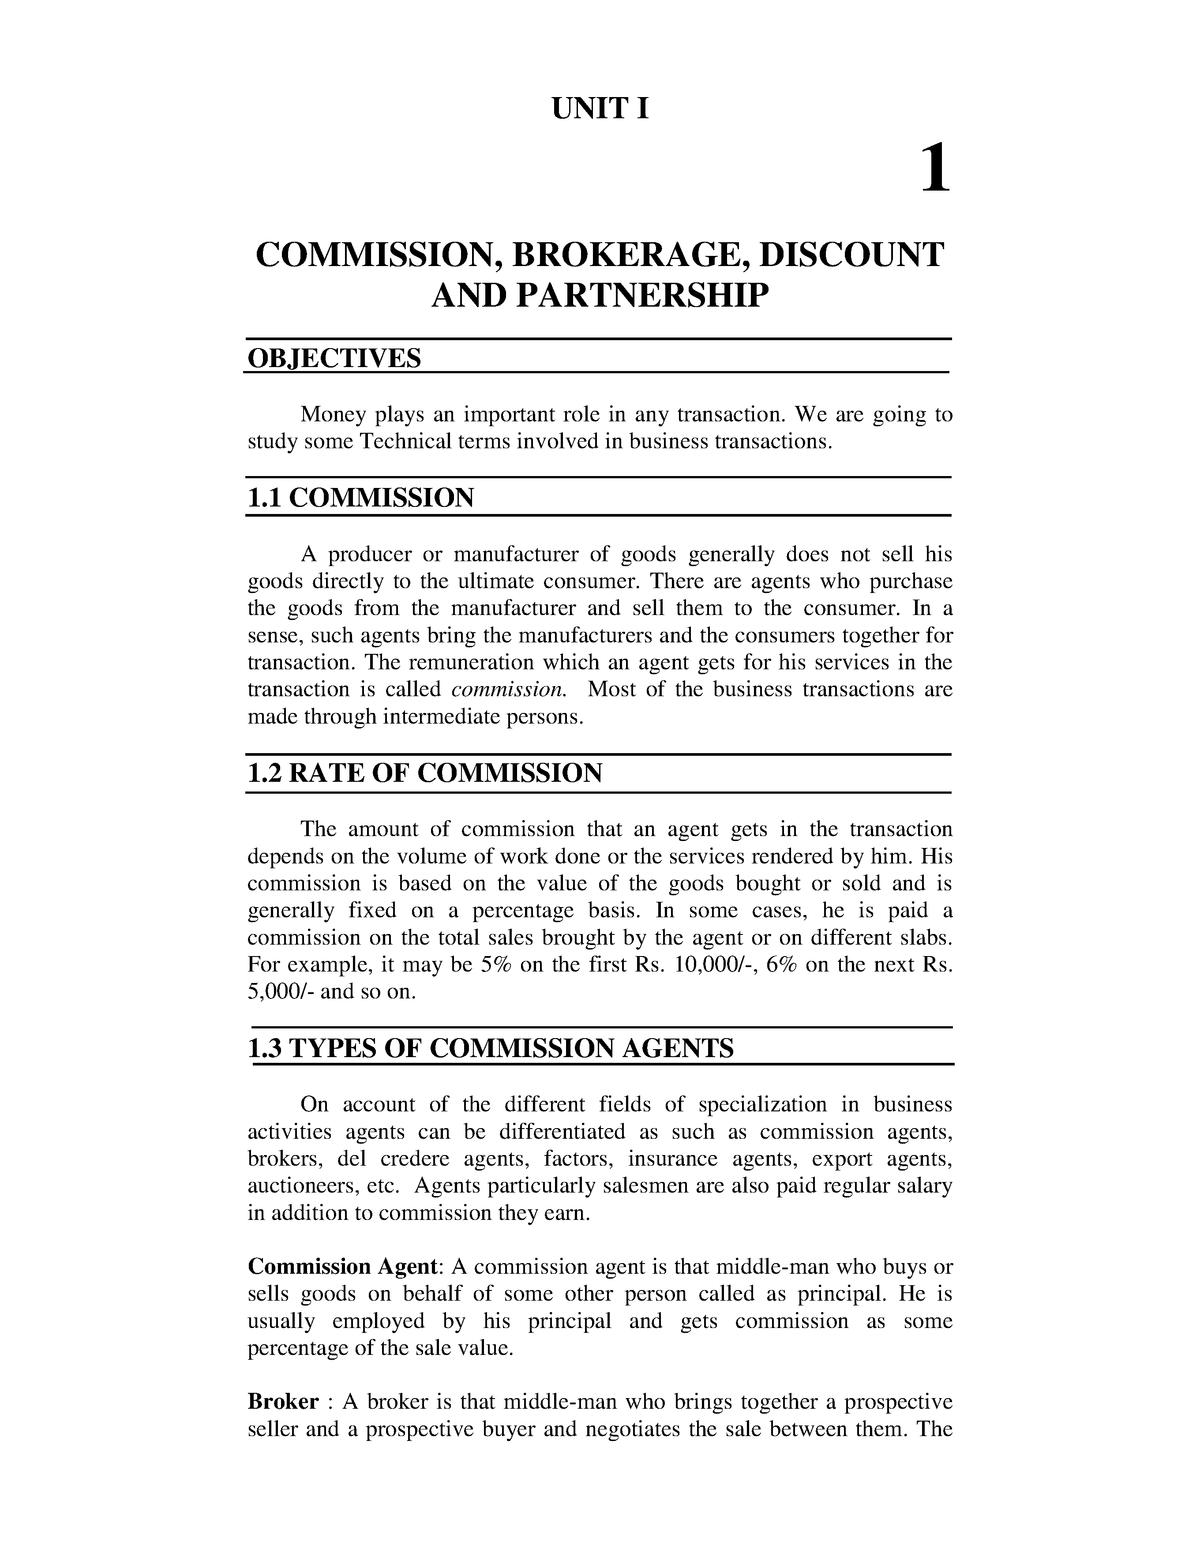 F Y B Com  Mathematics - MUM-COMMA-004: Banking And Finance